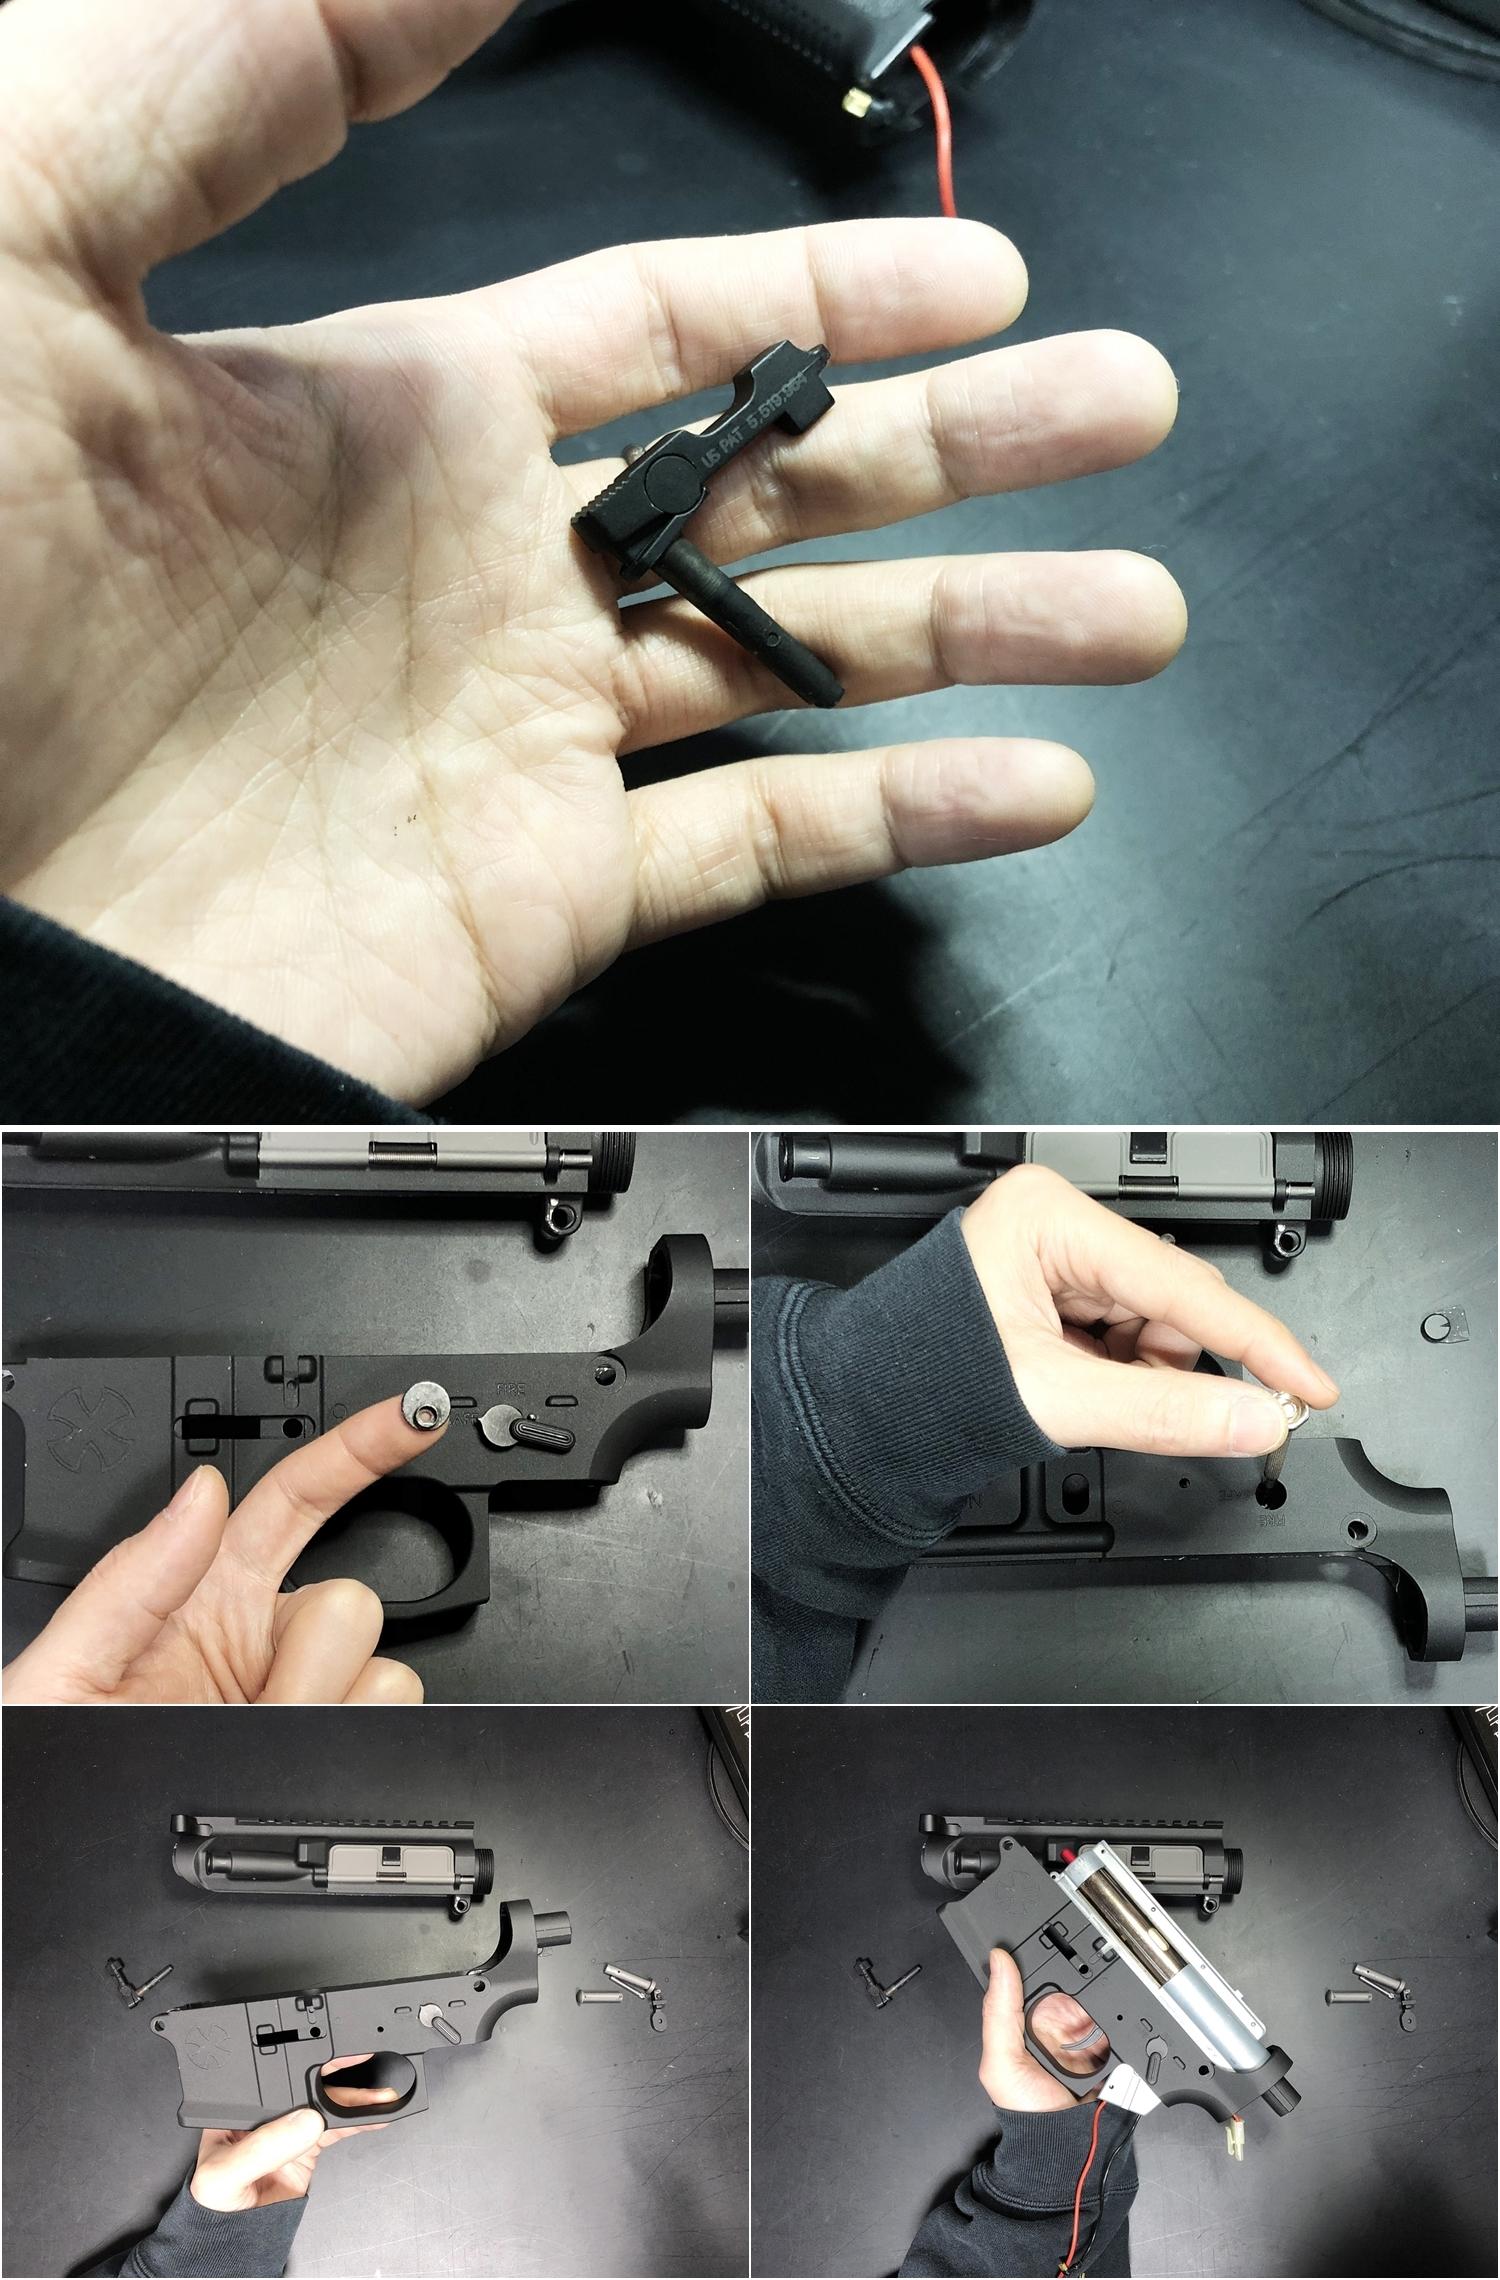 12 NOVESKE GEN3 N4 BY MADBULL!! 『第一弾』 新たにSTD民間系ARを作り始めたいと思います!! STD AR-15 M4 スタンダード 電動ガン マルイ ノベスケ ノベスキー マットブル メタルフレーム 動作テスト 組込 取付 カス